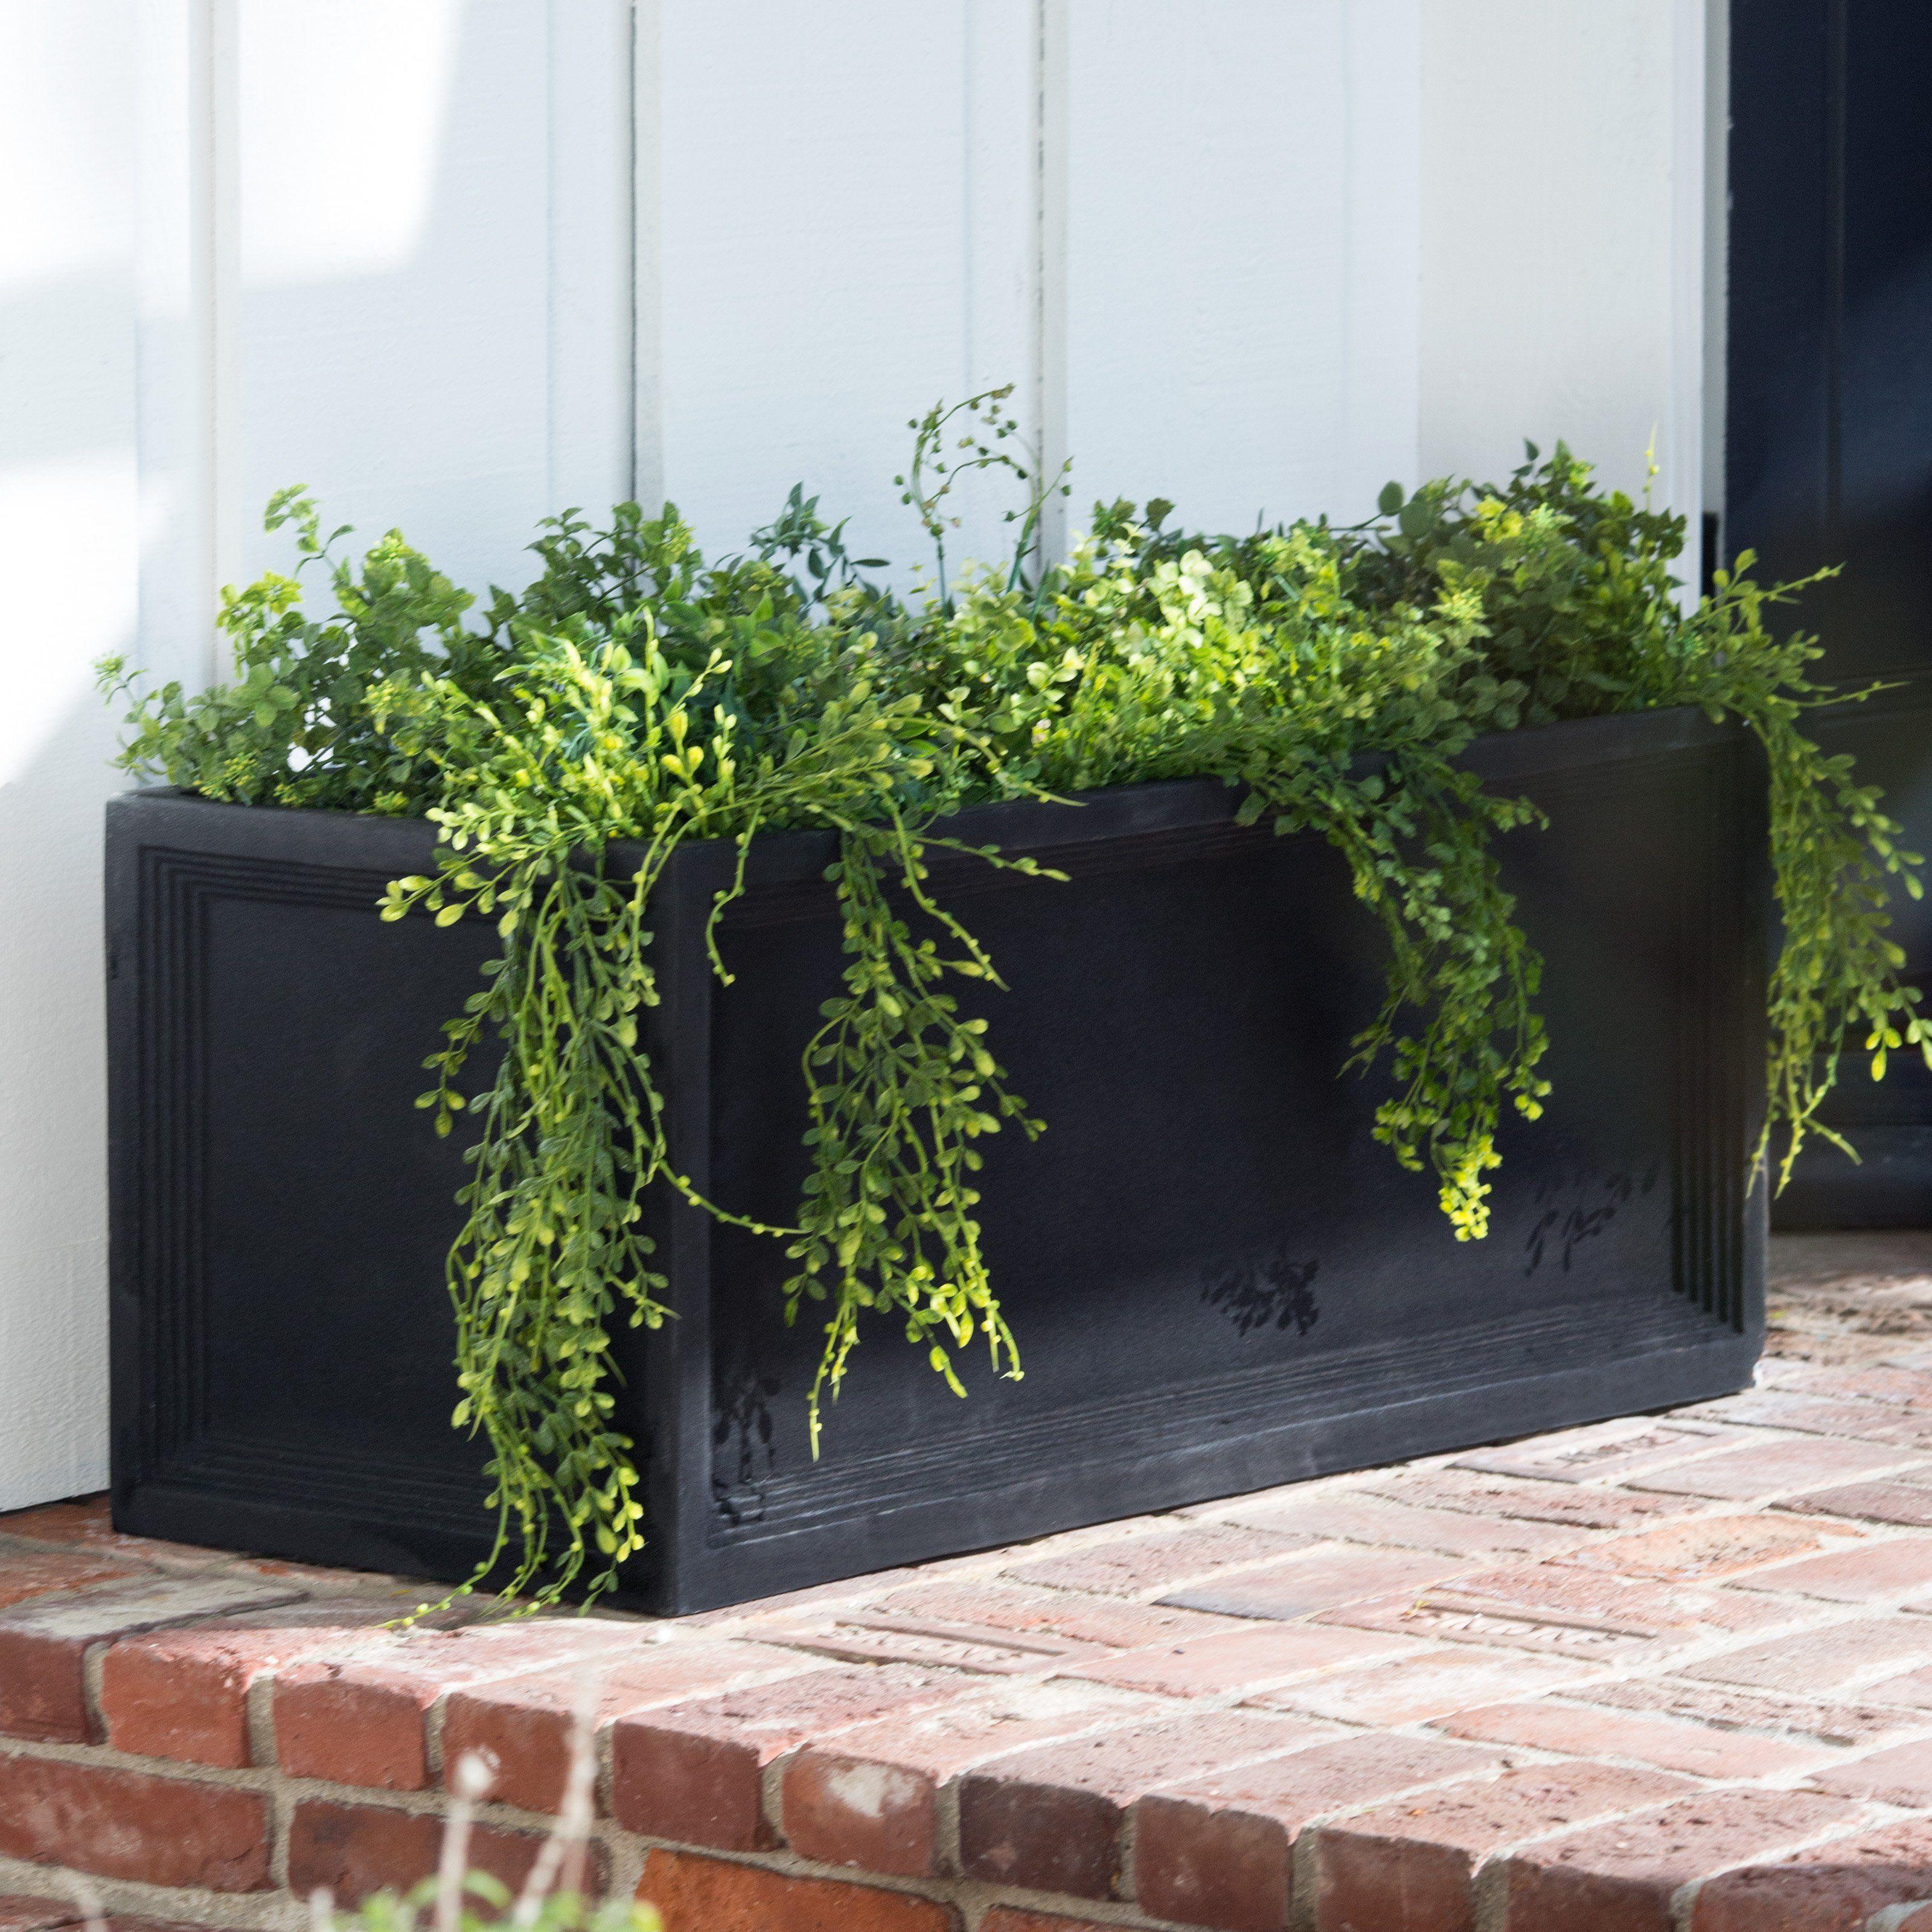 ko fresh decor kovot shop rectangular ceramic fun rectangle and functional tray planter accessories garden planters home saucer includes